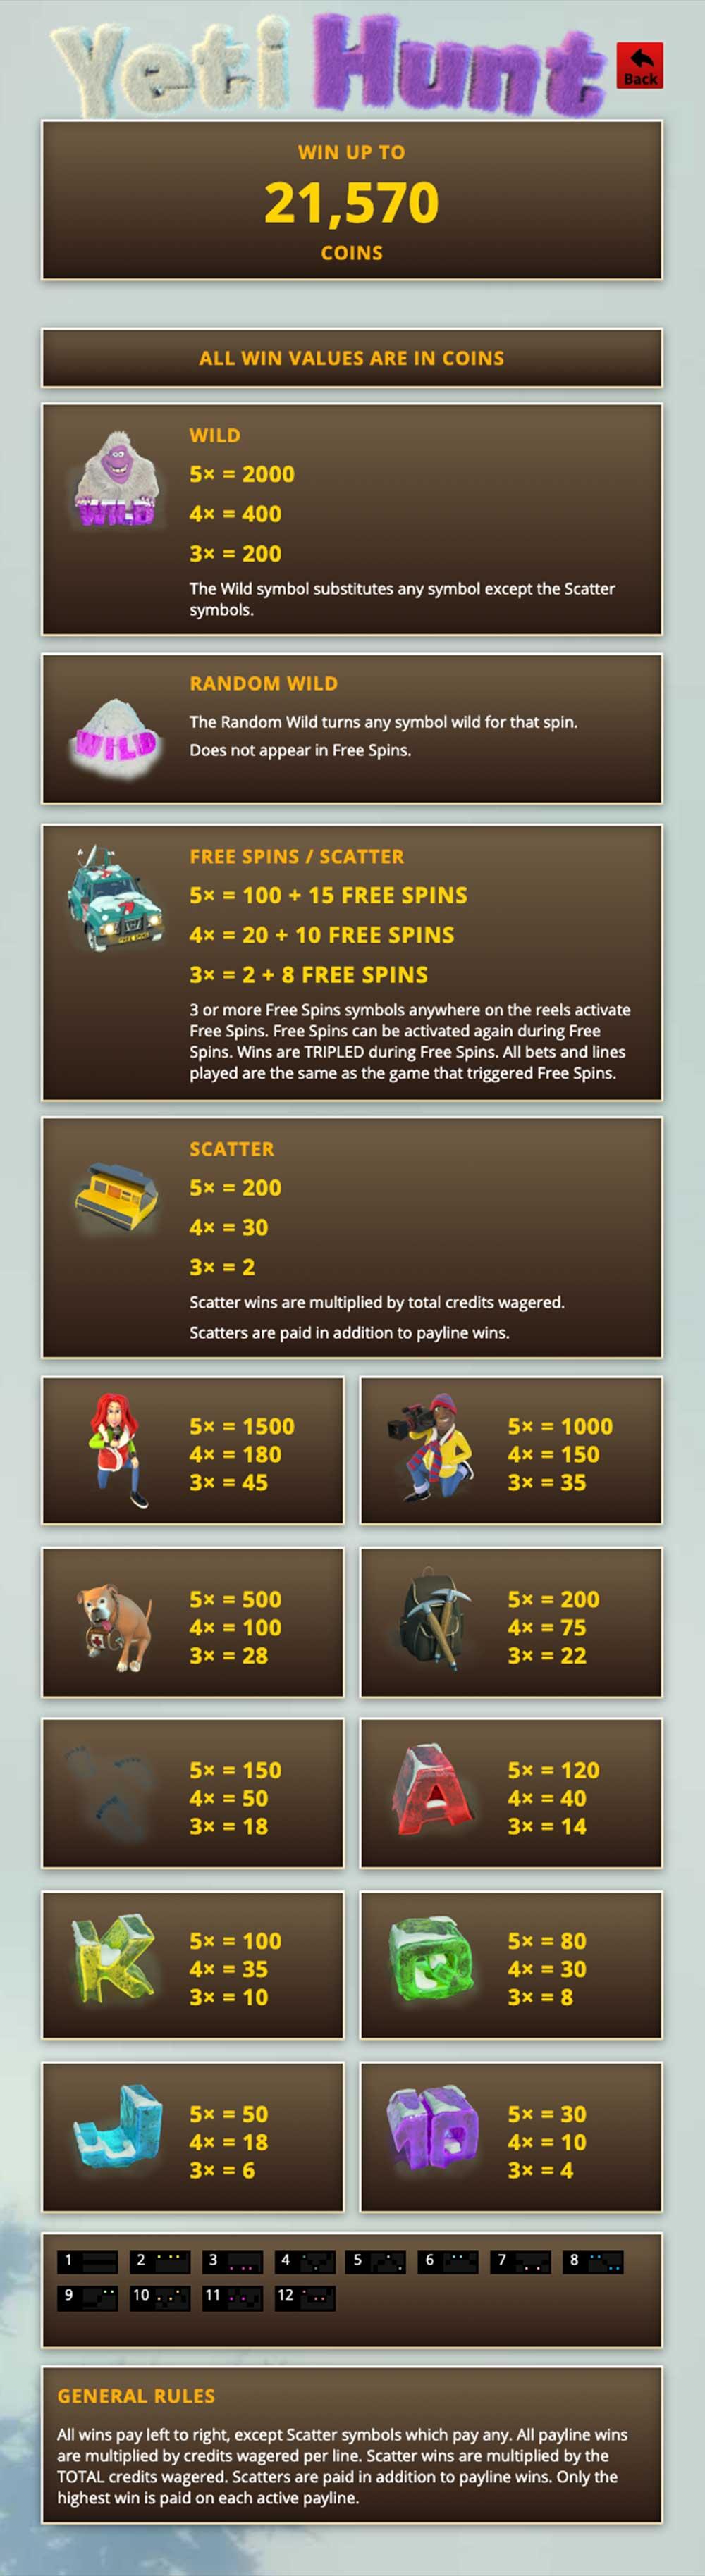 Yeti Hunt Pay Table Screenshot, CryptoThrills Casino